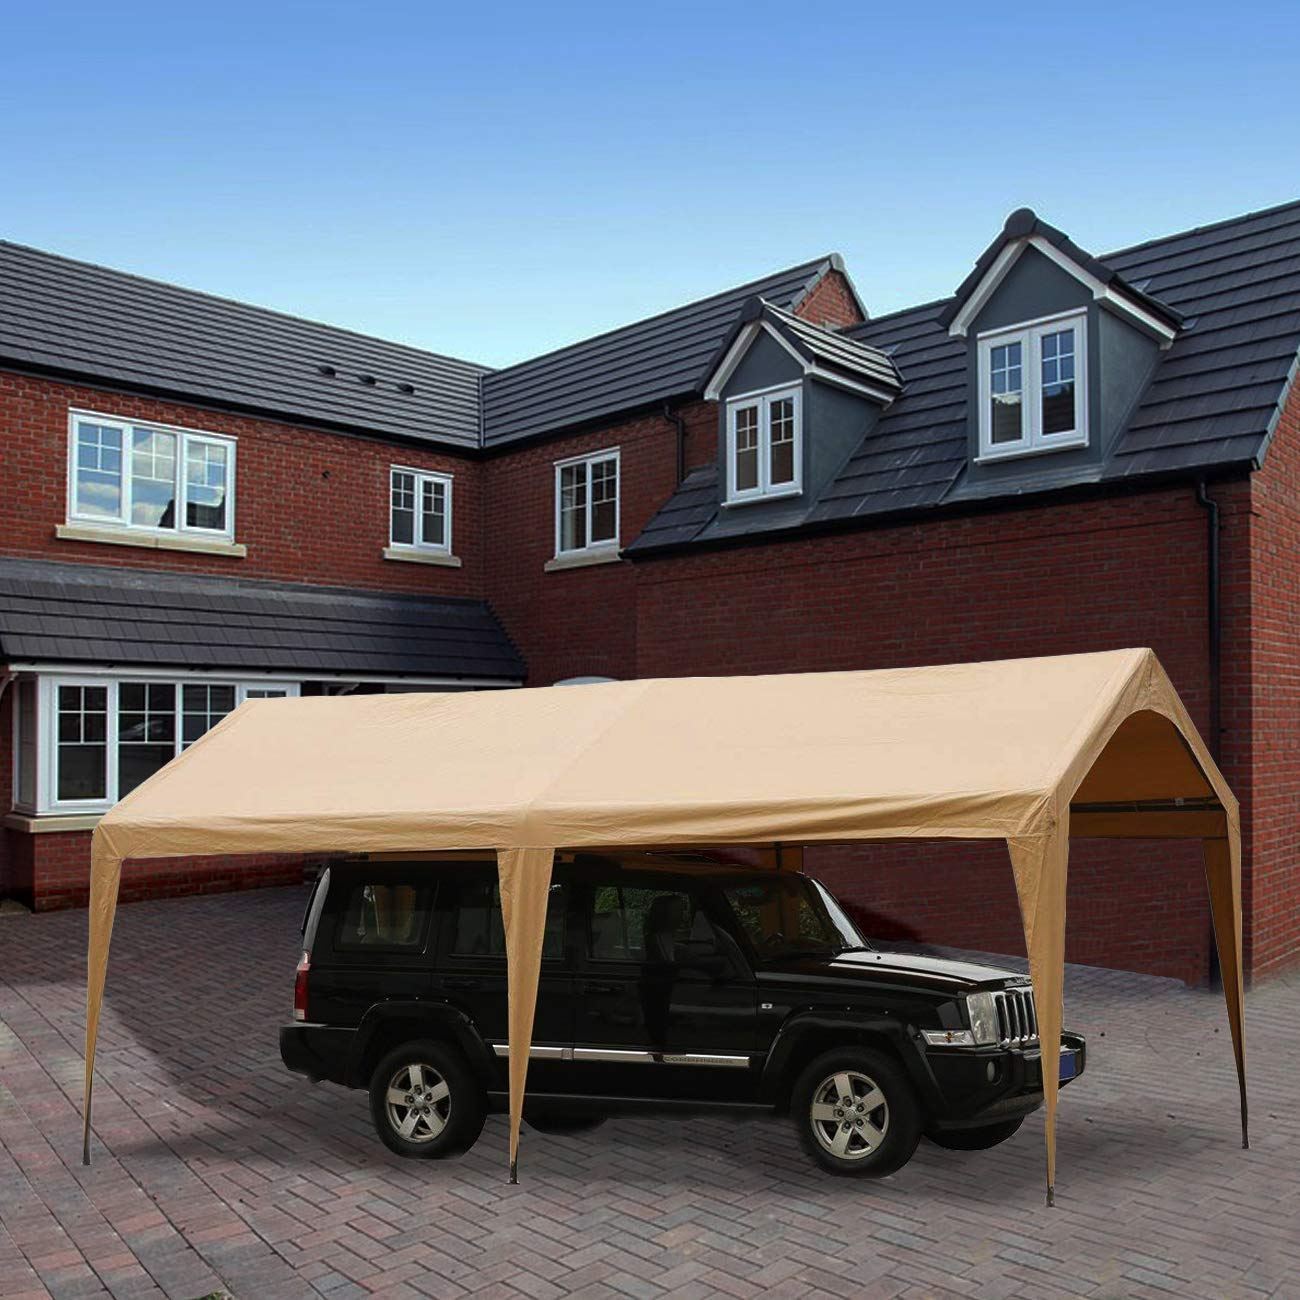 Abba Patio 10 X 20 Foot Portable Outdoor Carport Canopy With 6 Steel Legs Beige 818547025062